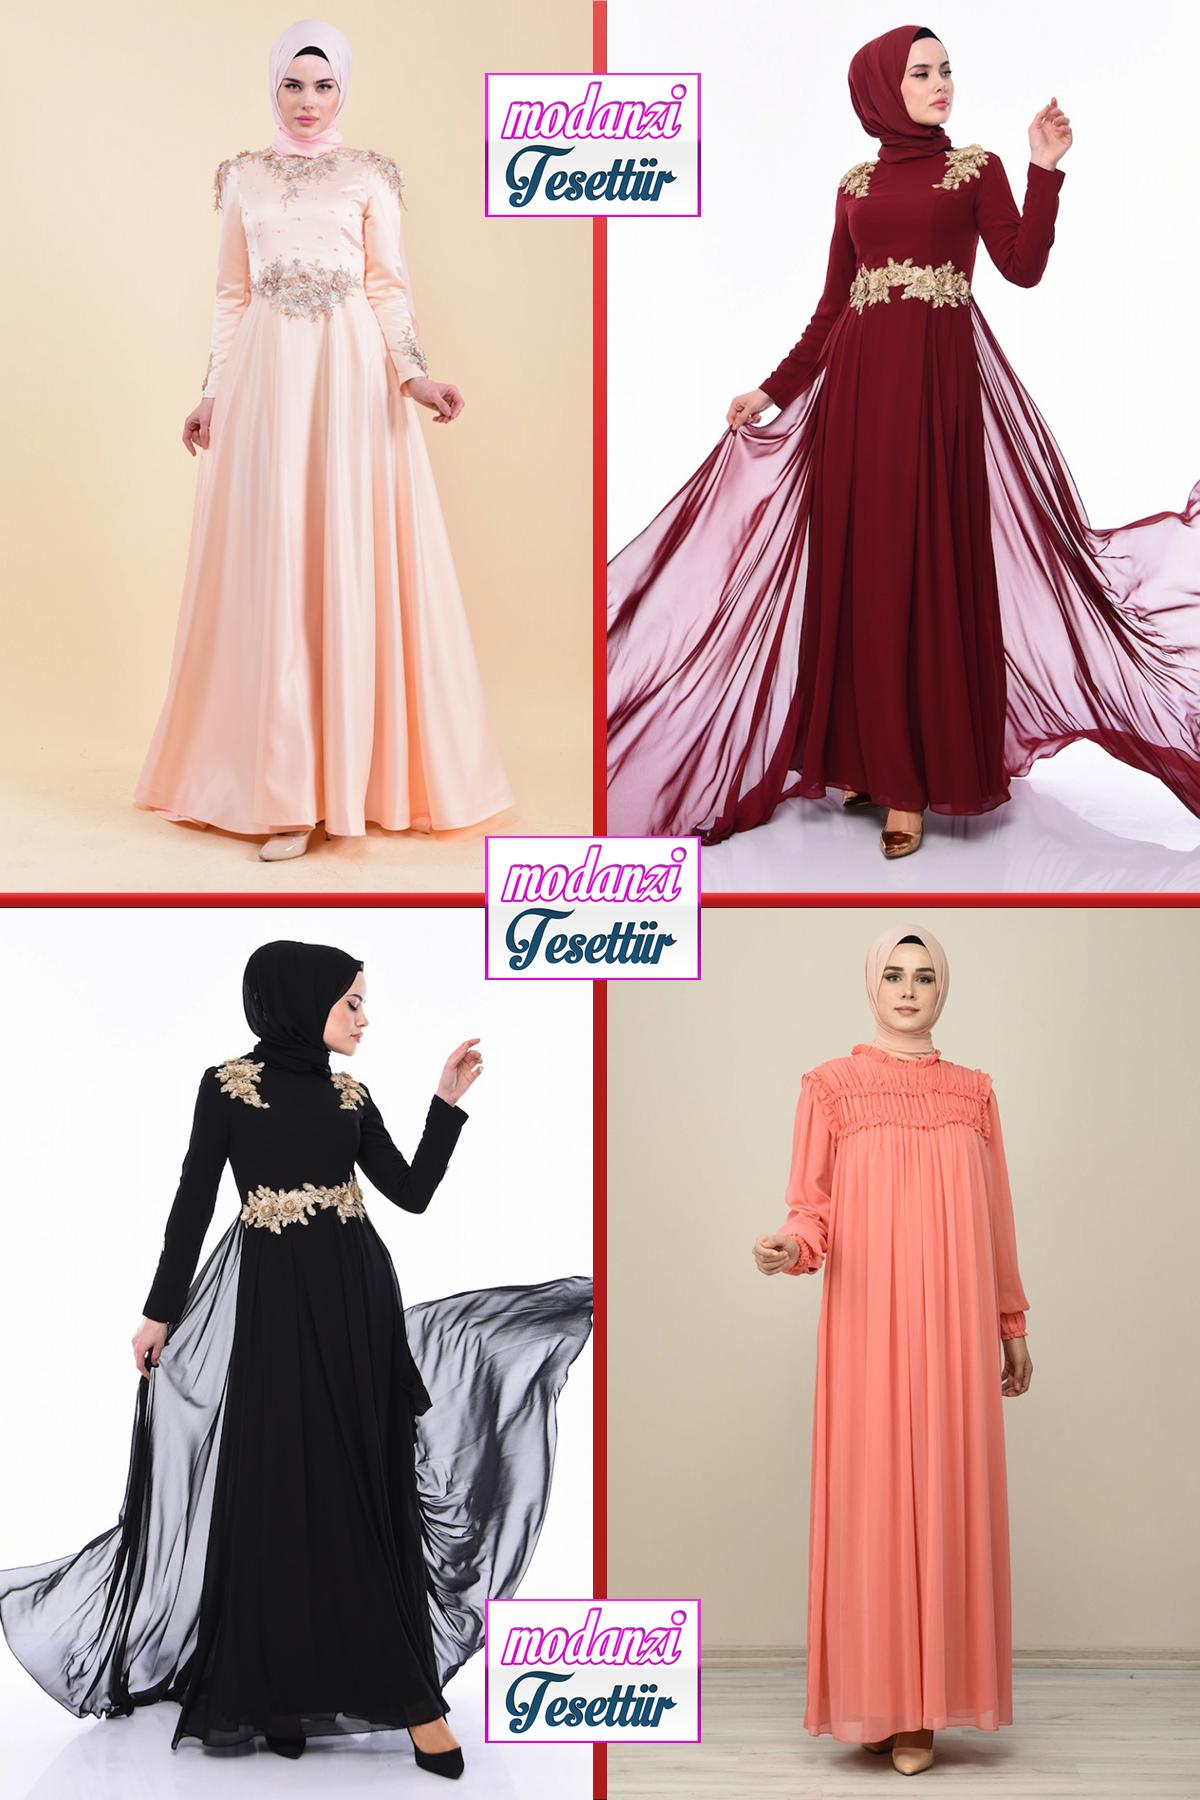 2020 Sefamerve Tesettur Abiye Elbise Modelleri 11 30 Abendkleid Evening Dress 2020 Moda Stilleri Elbise Resmi Elbise